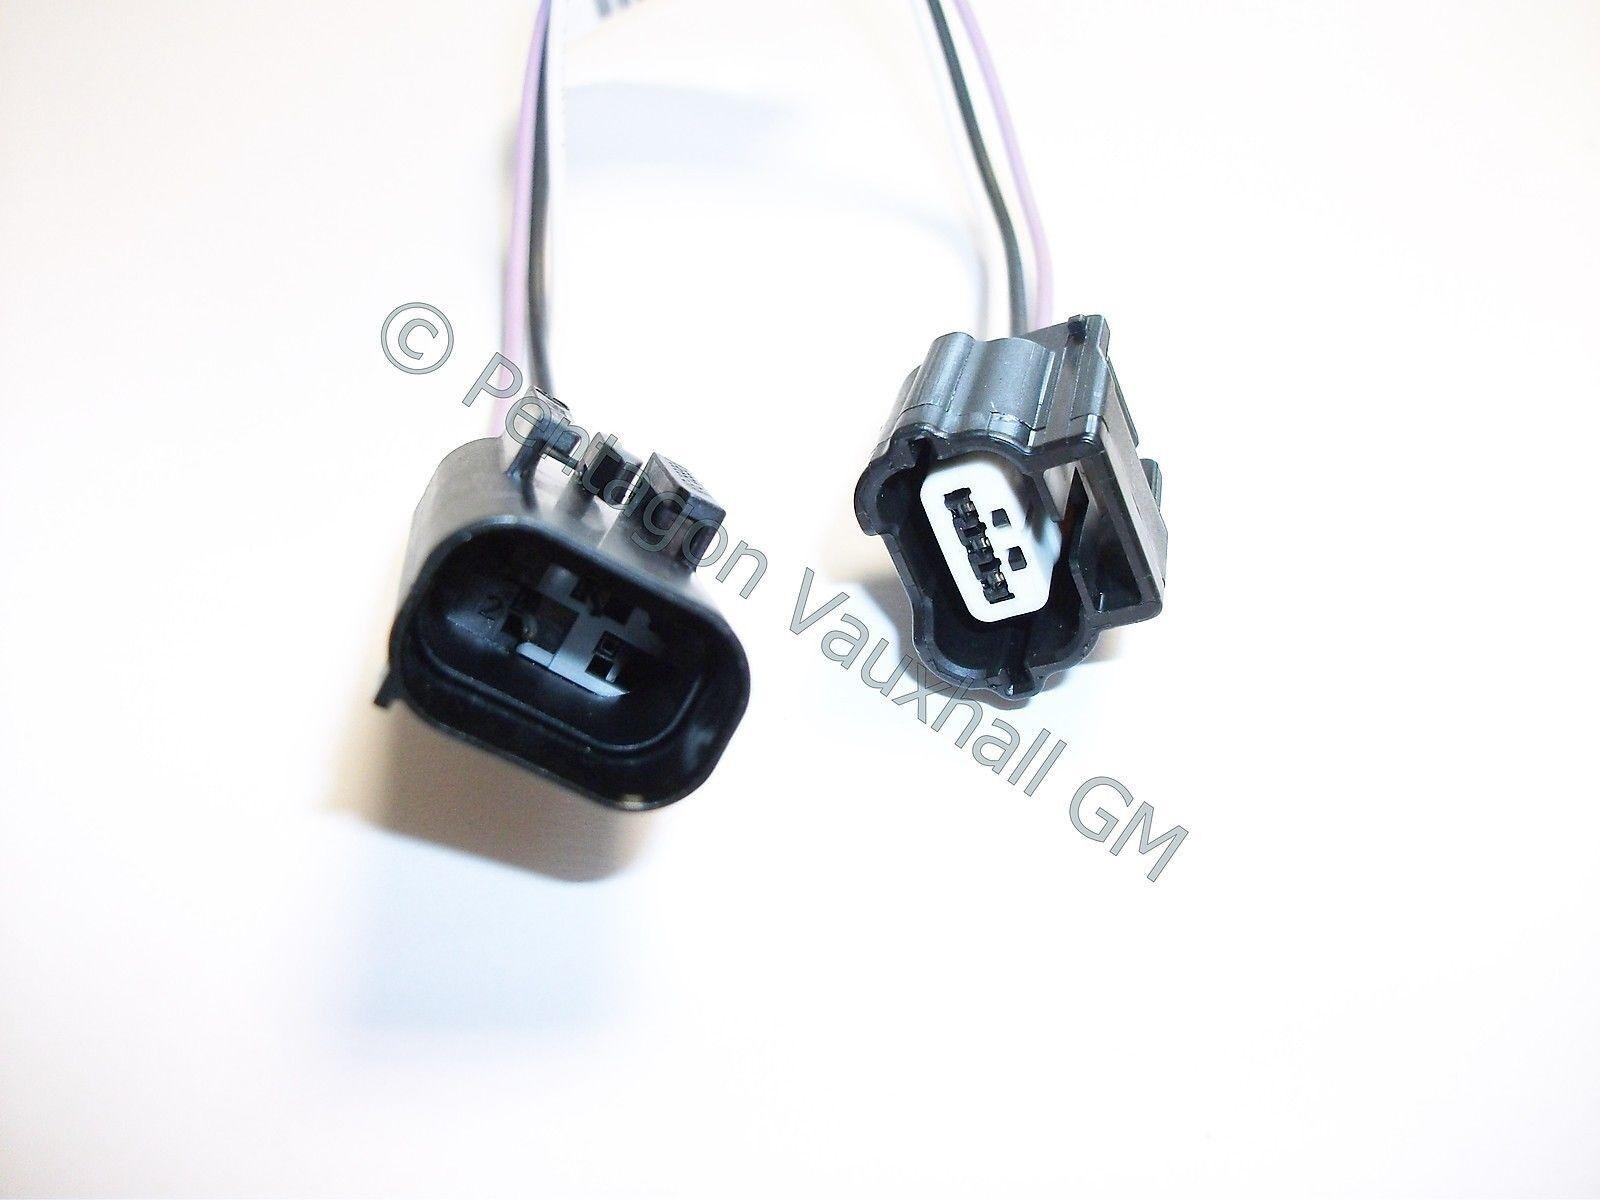 Renault Trafic Rear Fog Light Wiring Diagram Lights Genuine Vauxhall Vivaro Lamp